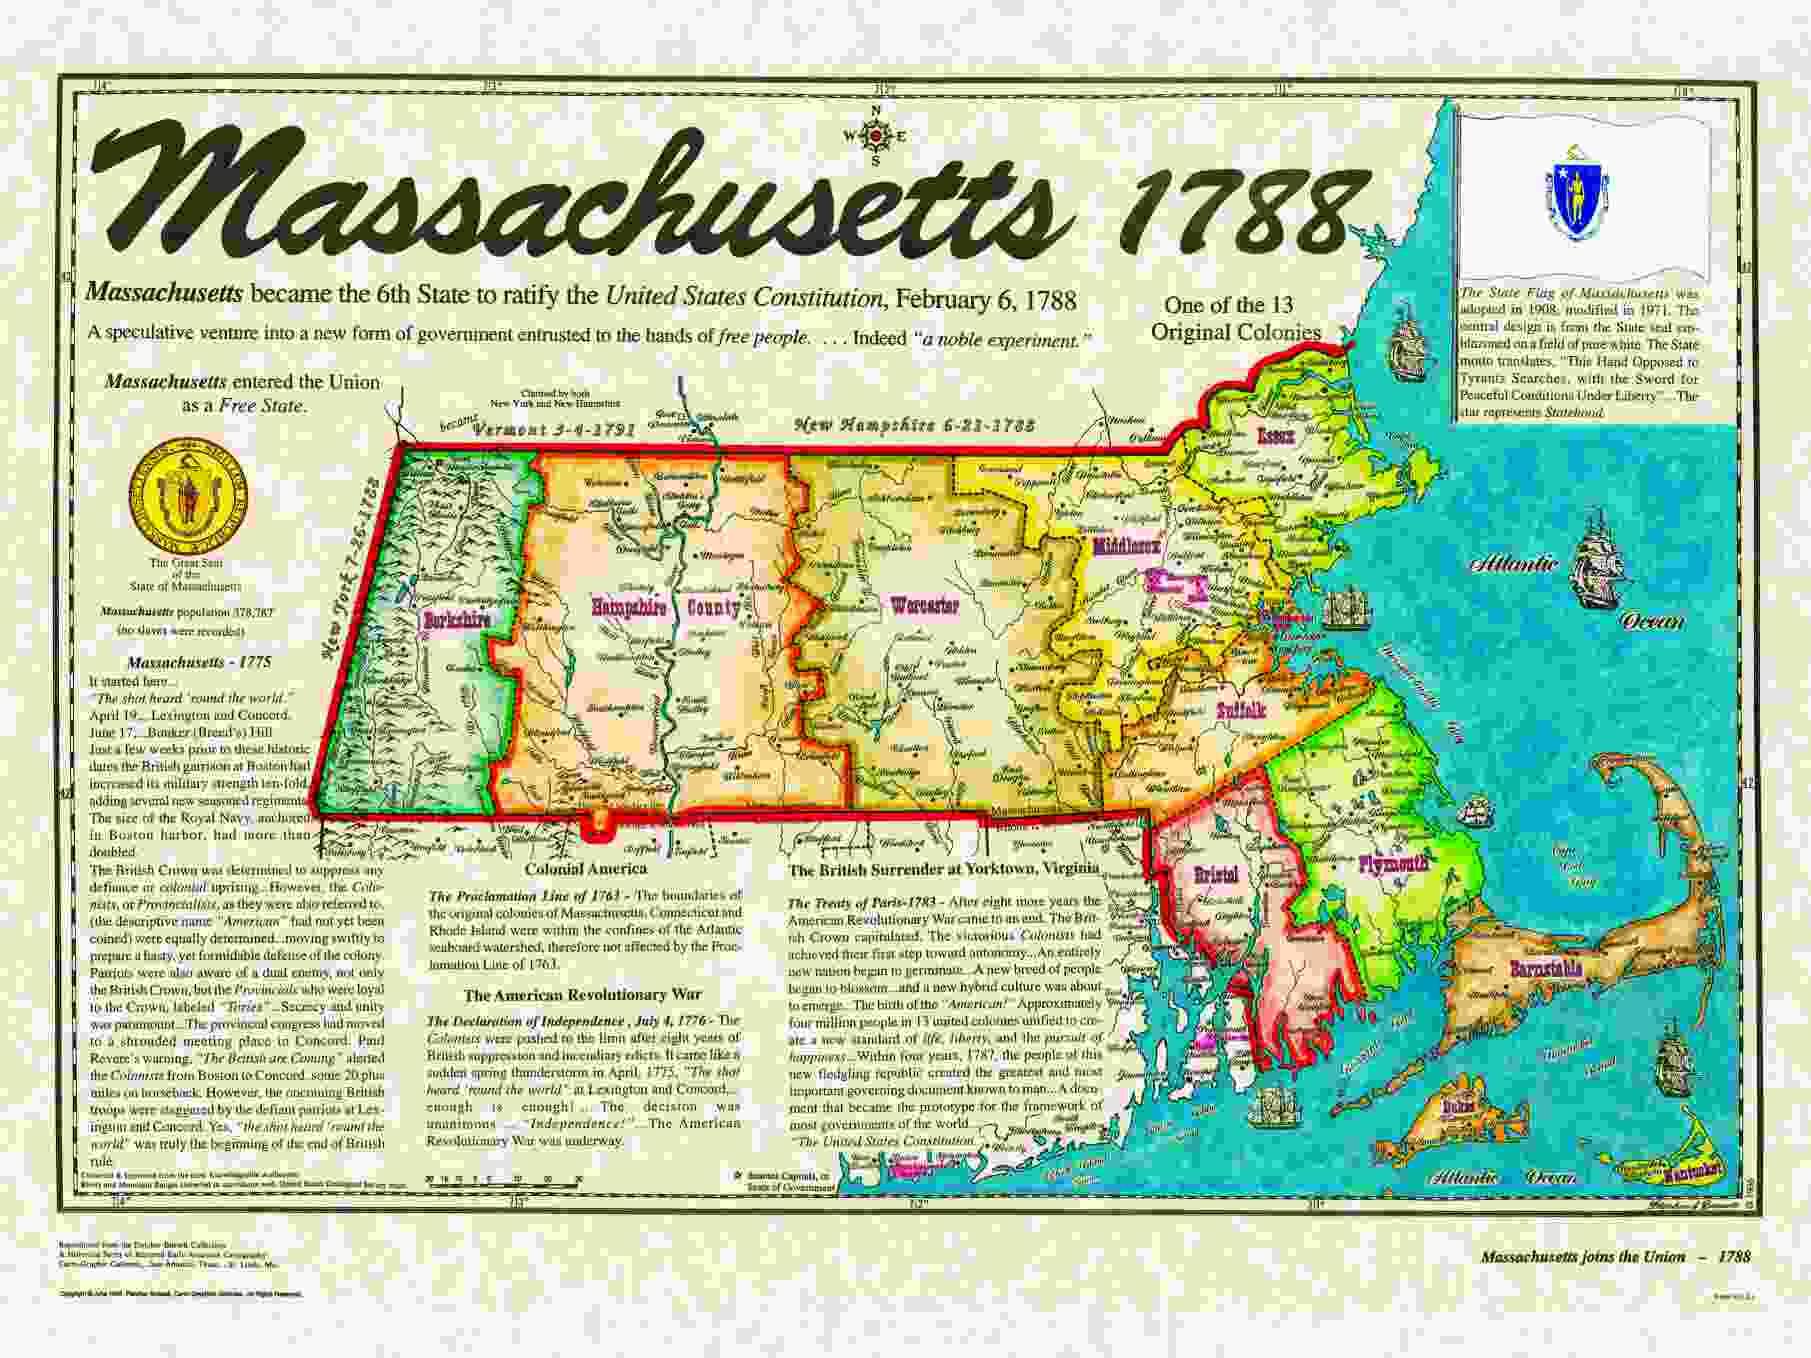 Original States - Massachusetts on the us map